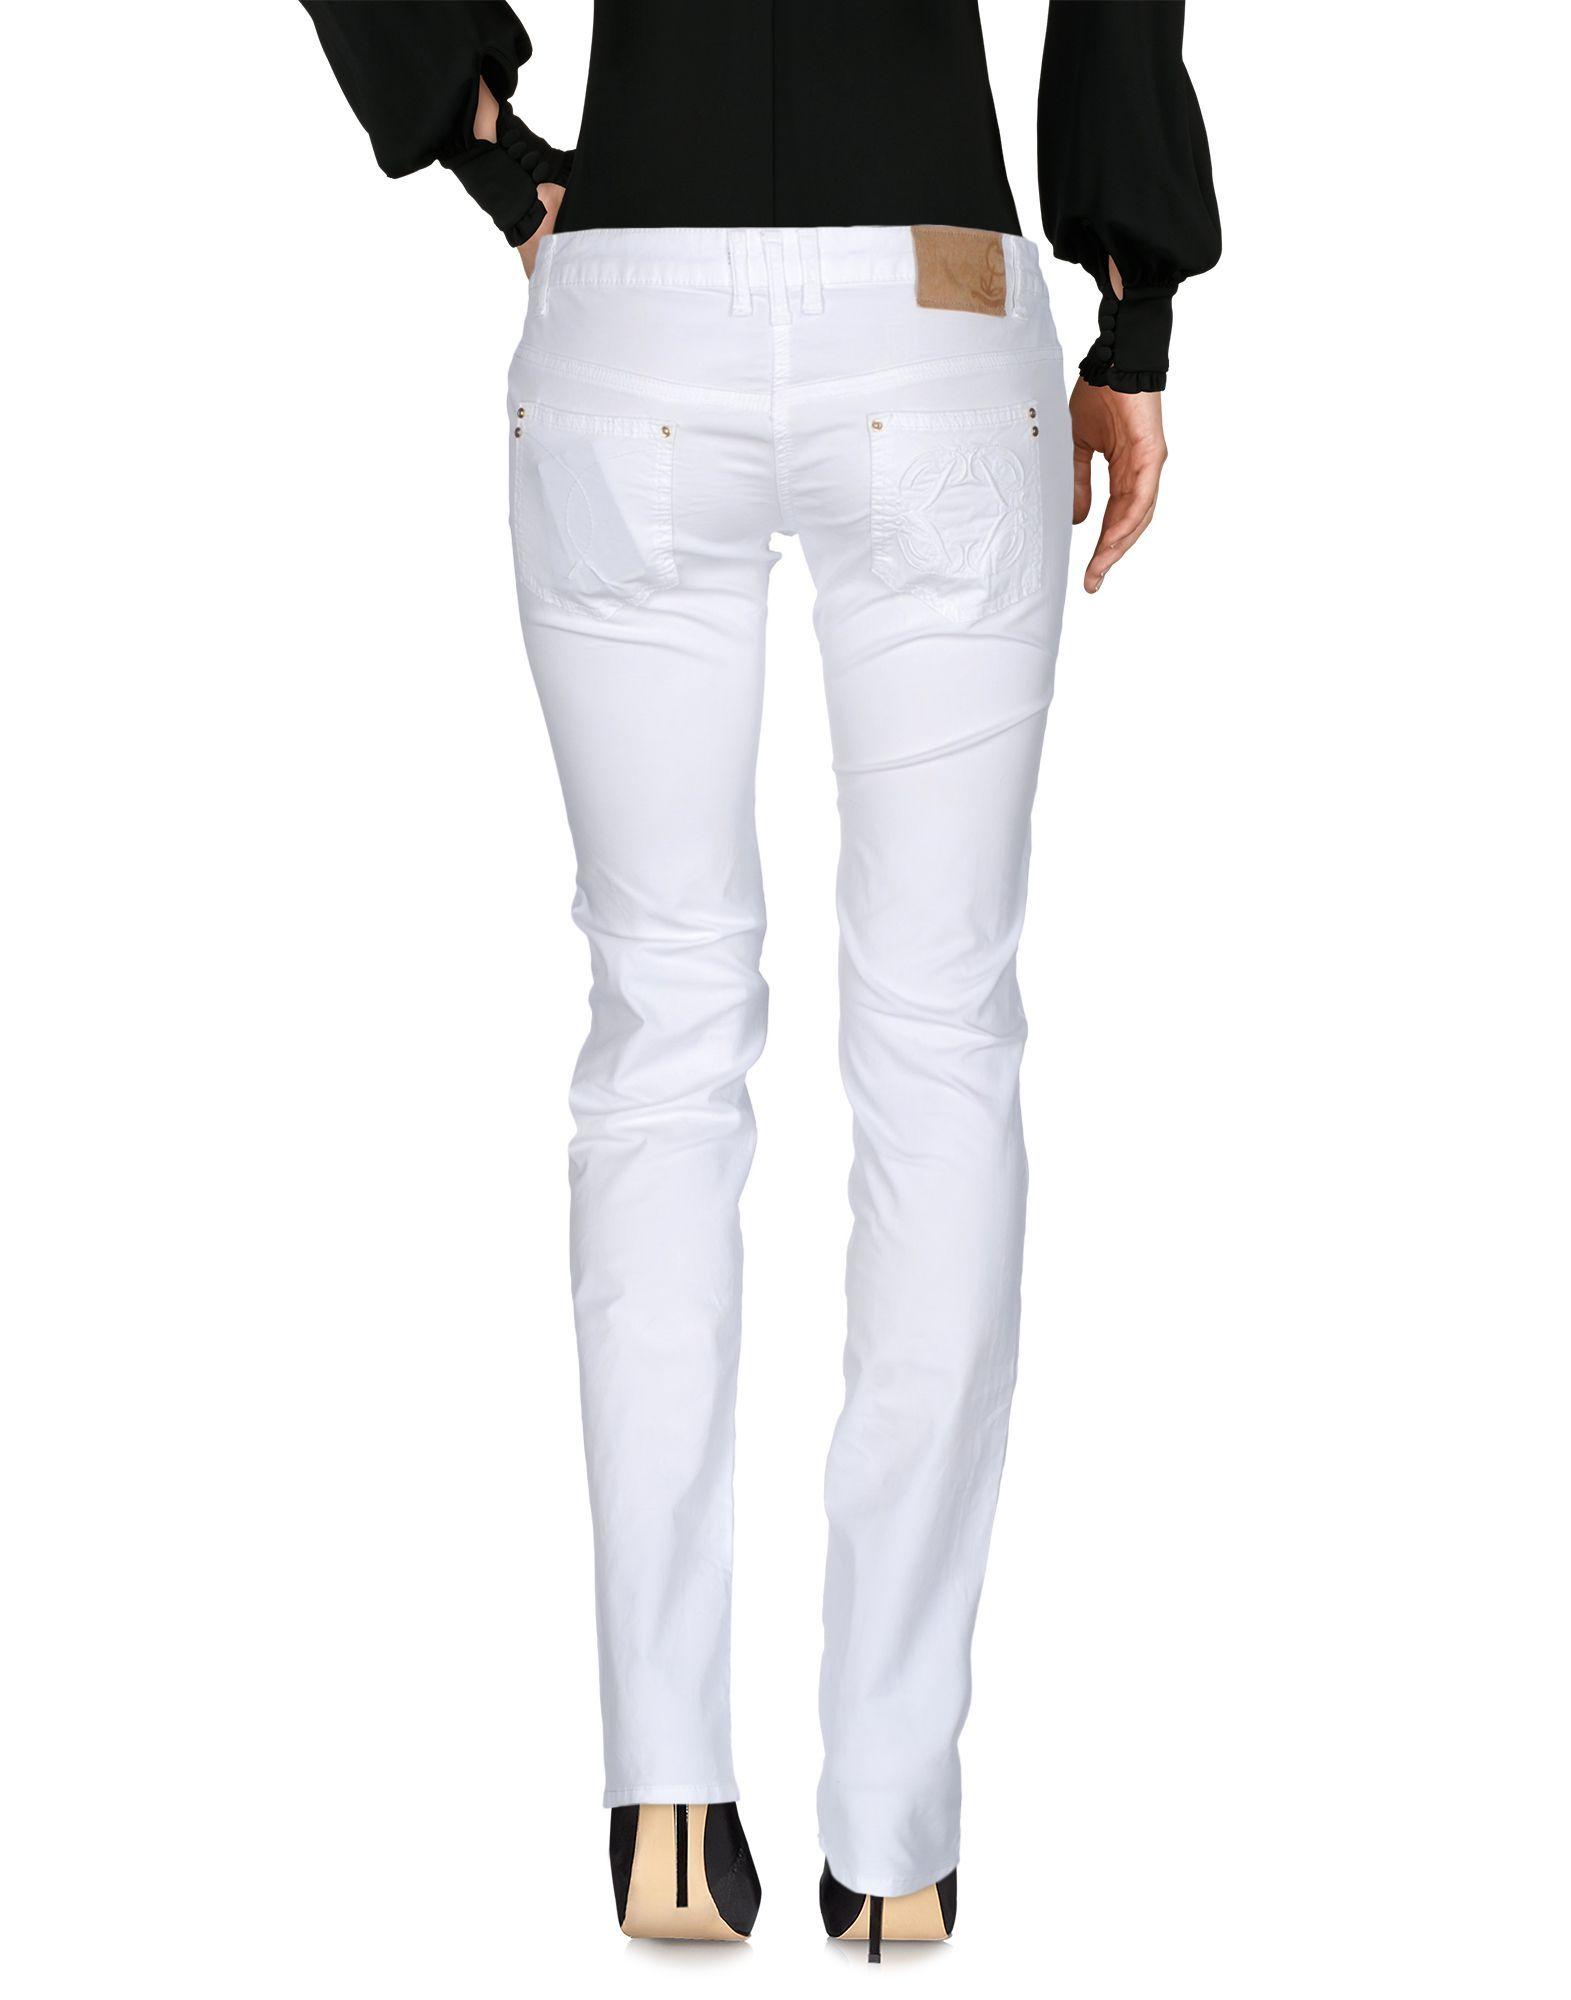 Patrizia Pepe White Cotton Trousers